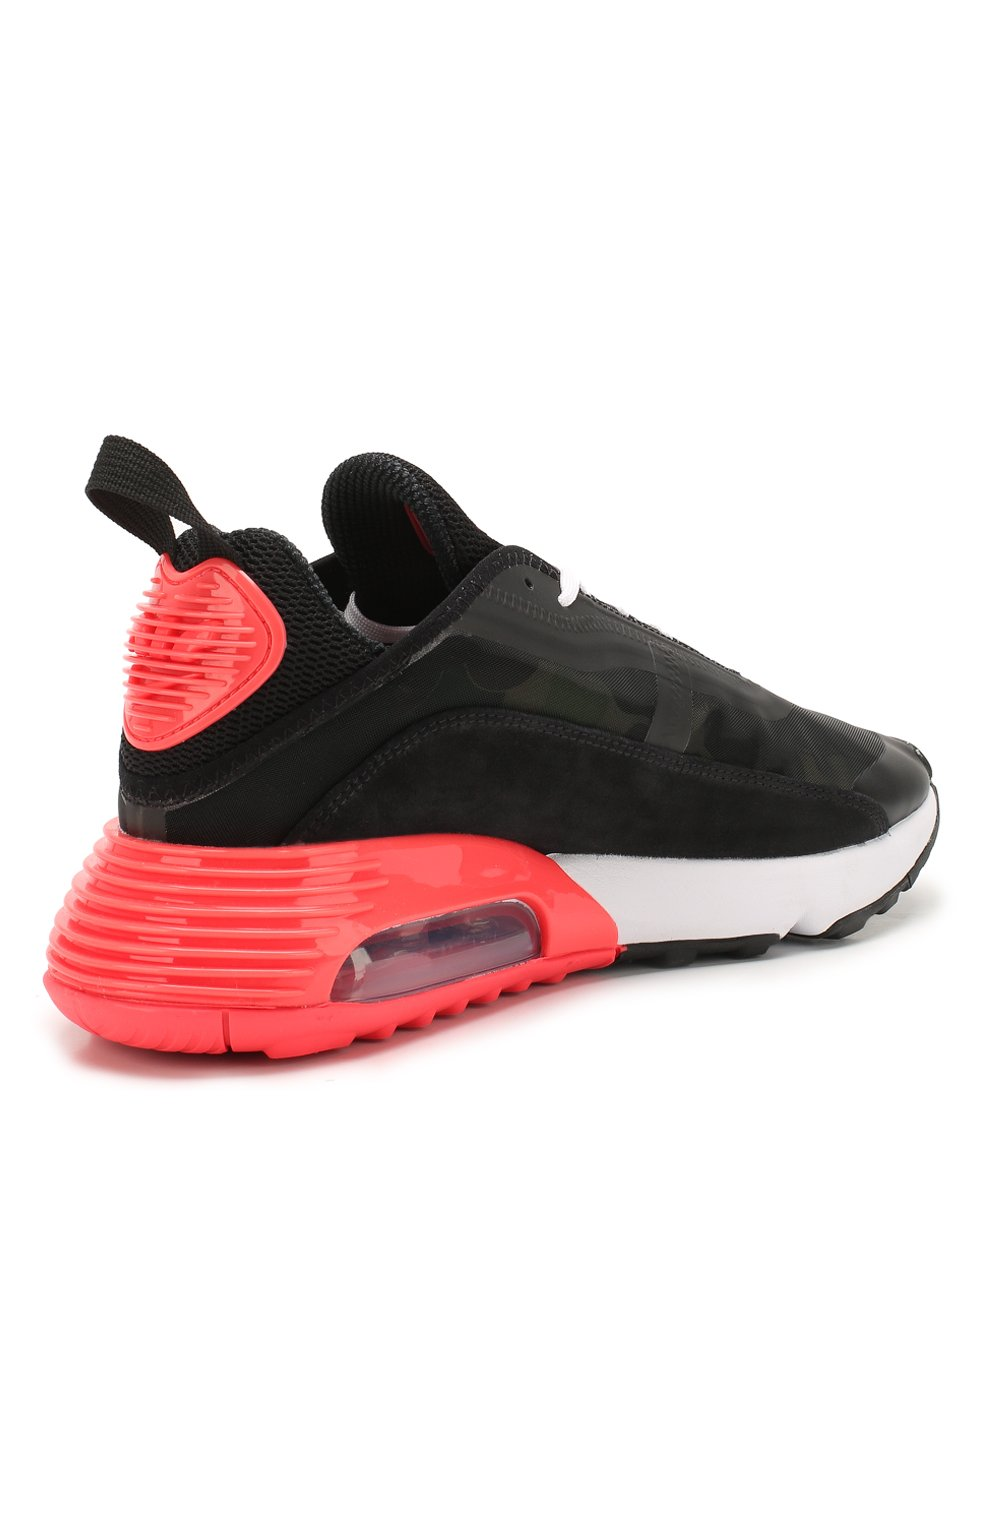 Мужские кроссовки nike air max 2090 NIKELAB черного цвета, арт. CU9174-600 | Фото 4